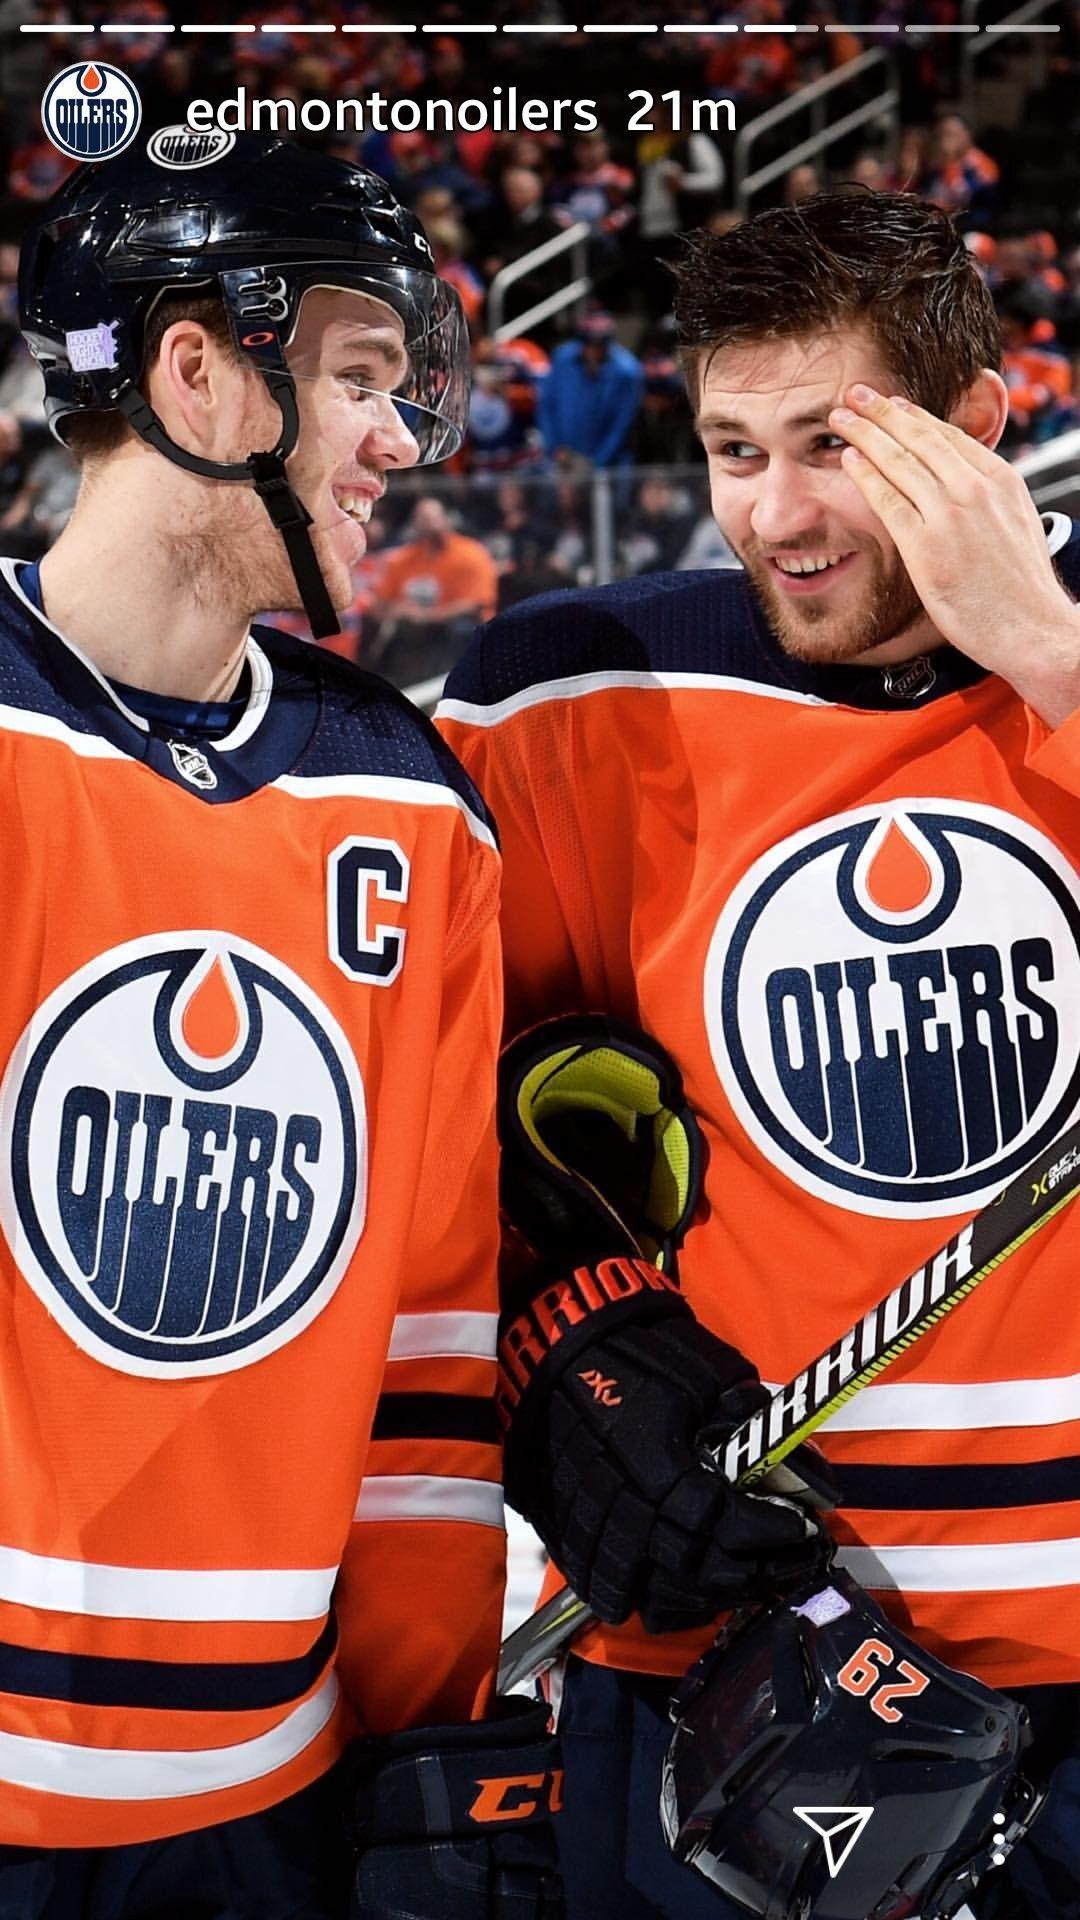 Dynamic Duo McDavid and Draisaitl Oilers hockey